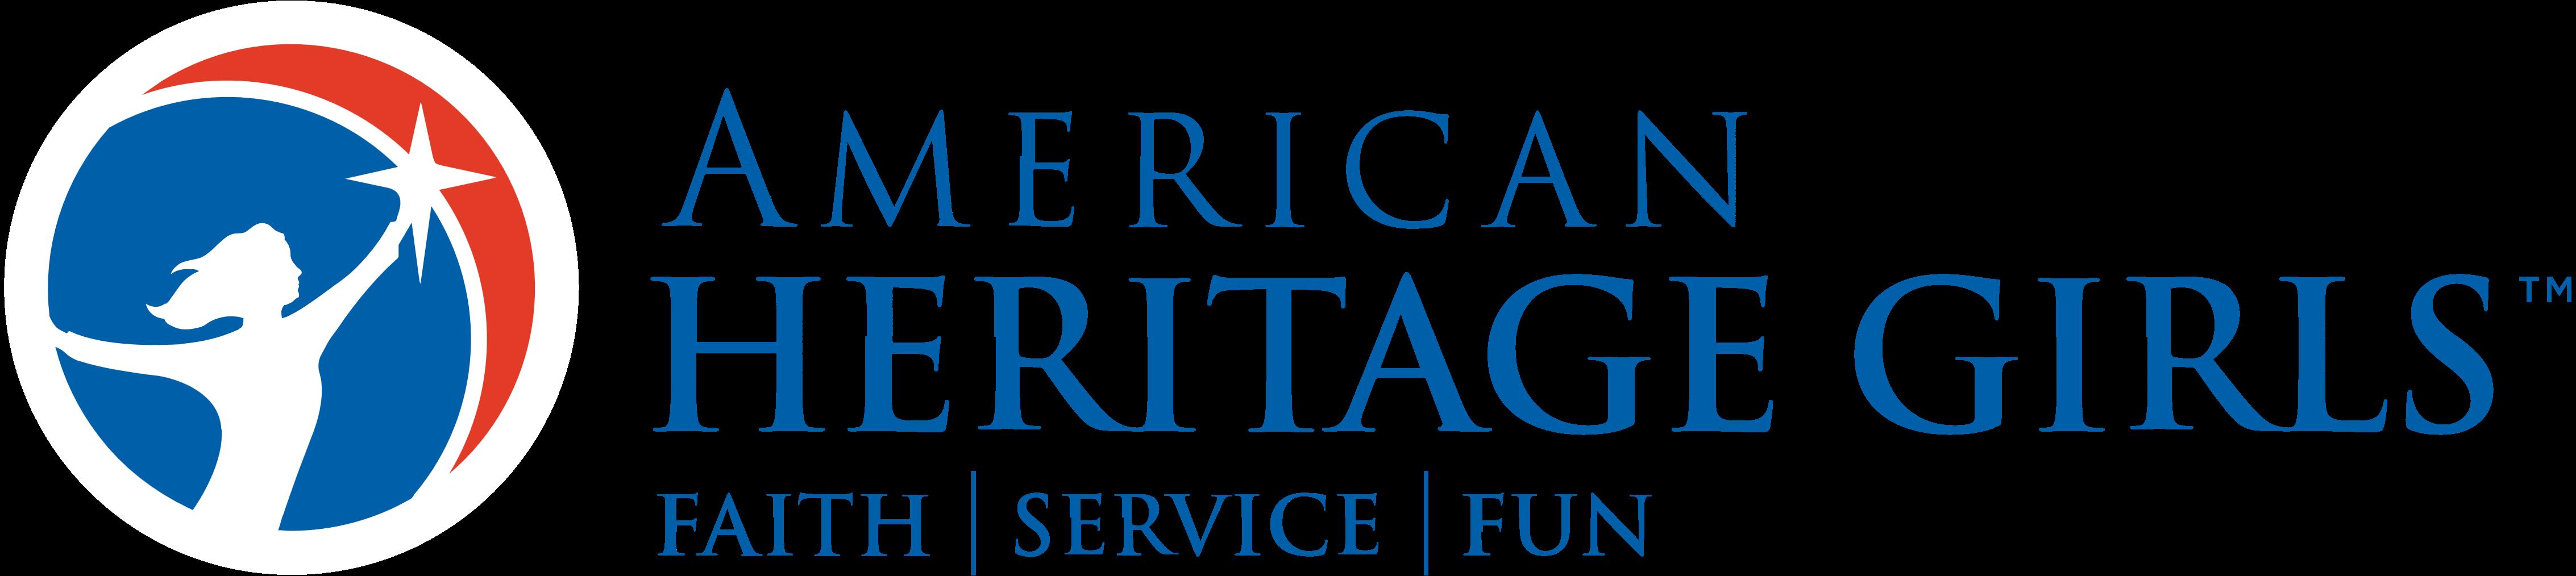 American Heritage Girls Storefront